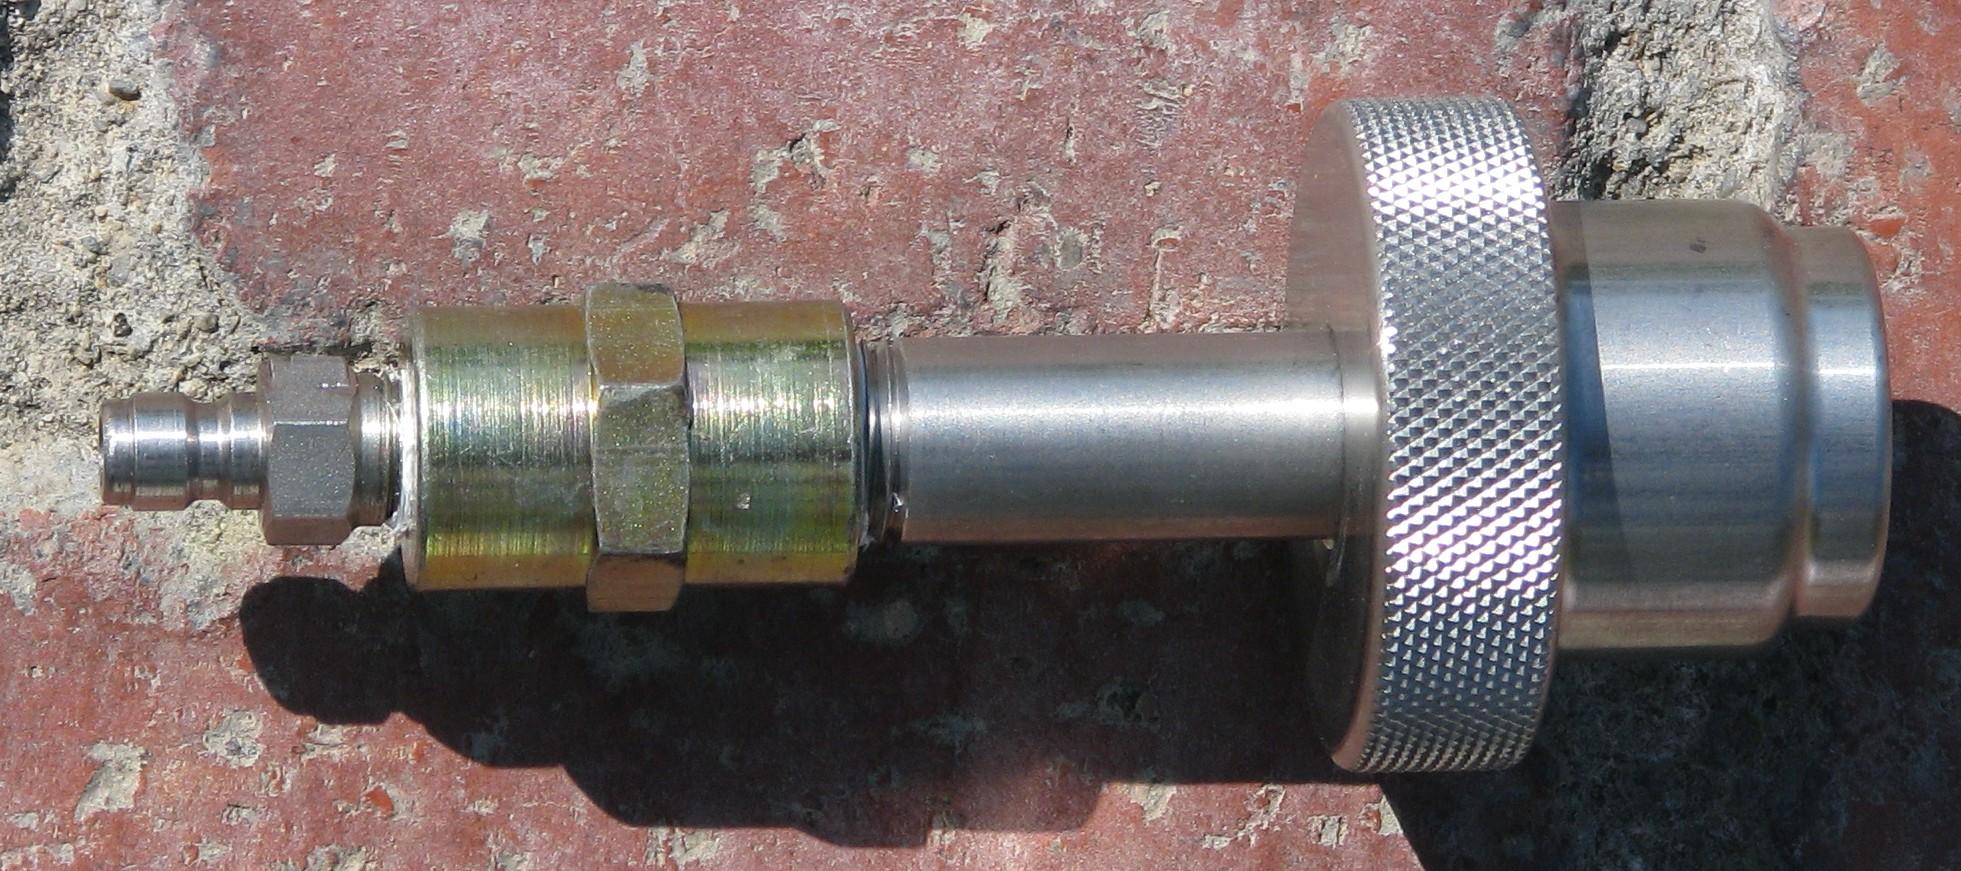 Threads on SCBA CF 4500 PSI tanks / valves?